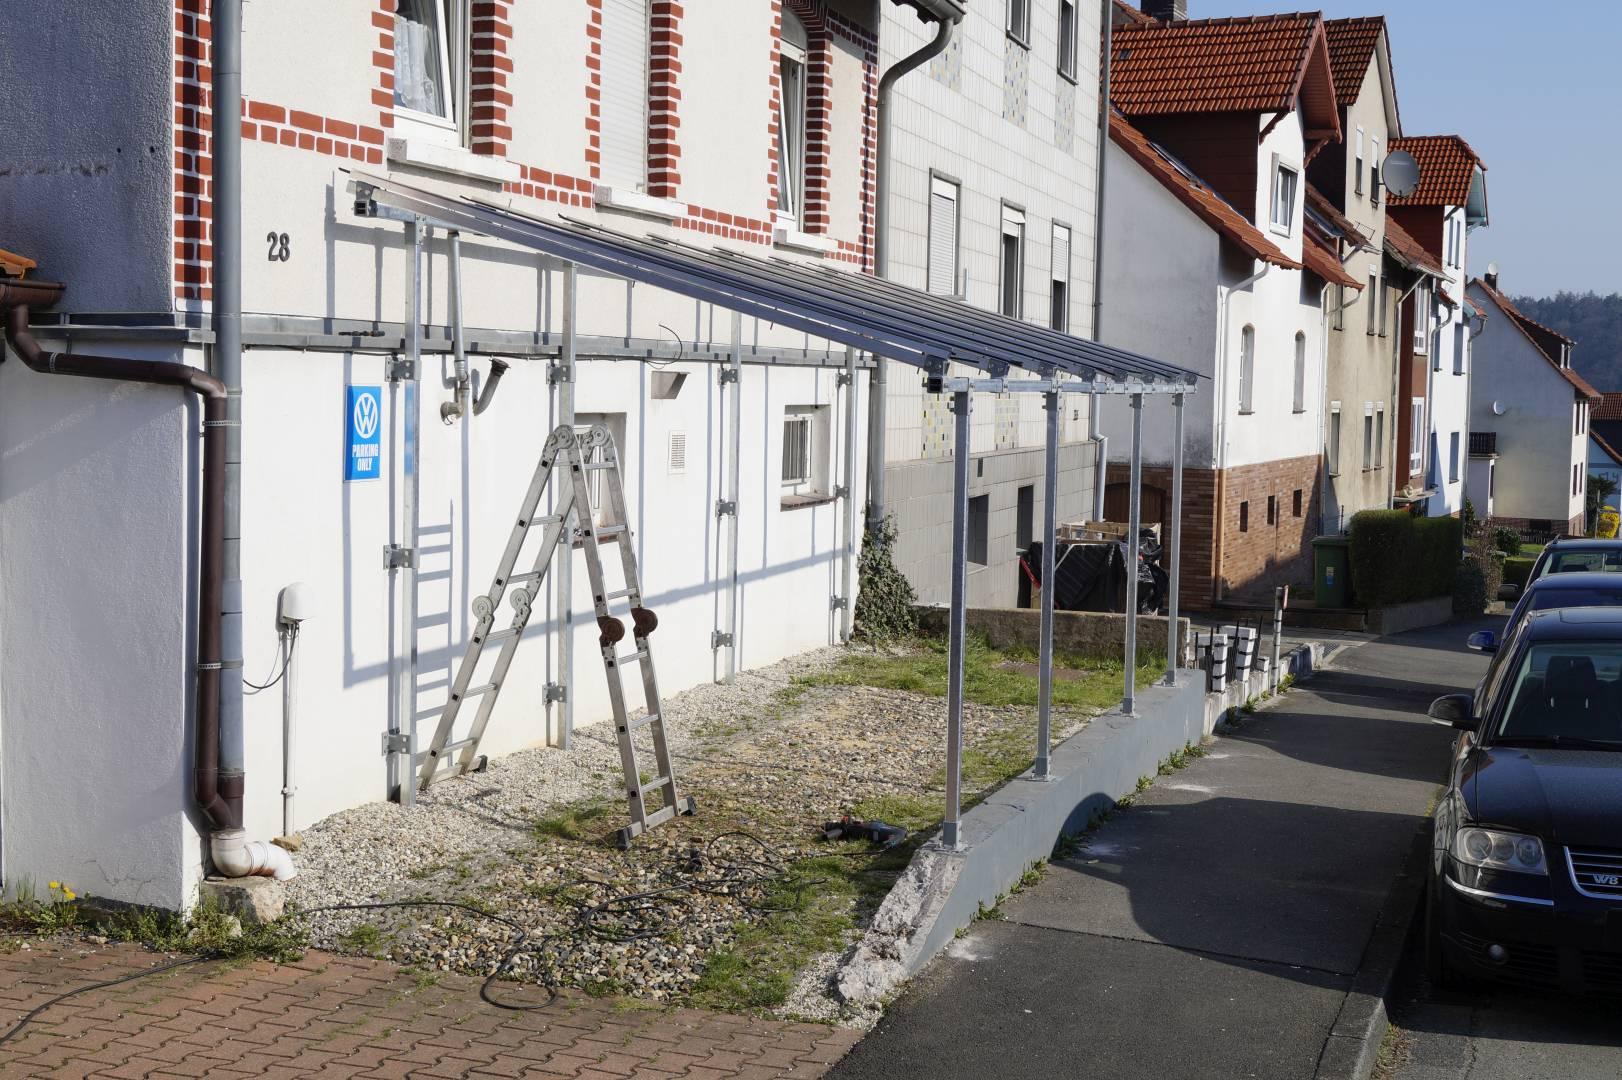 Carport_Aufbau_D04.jpg